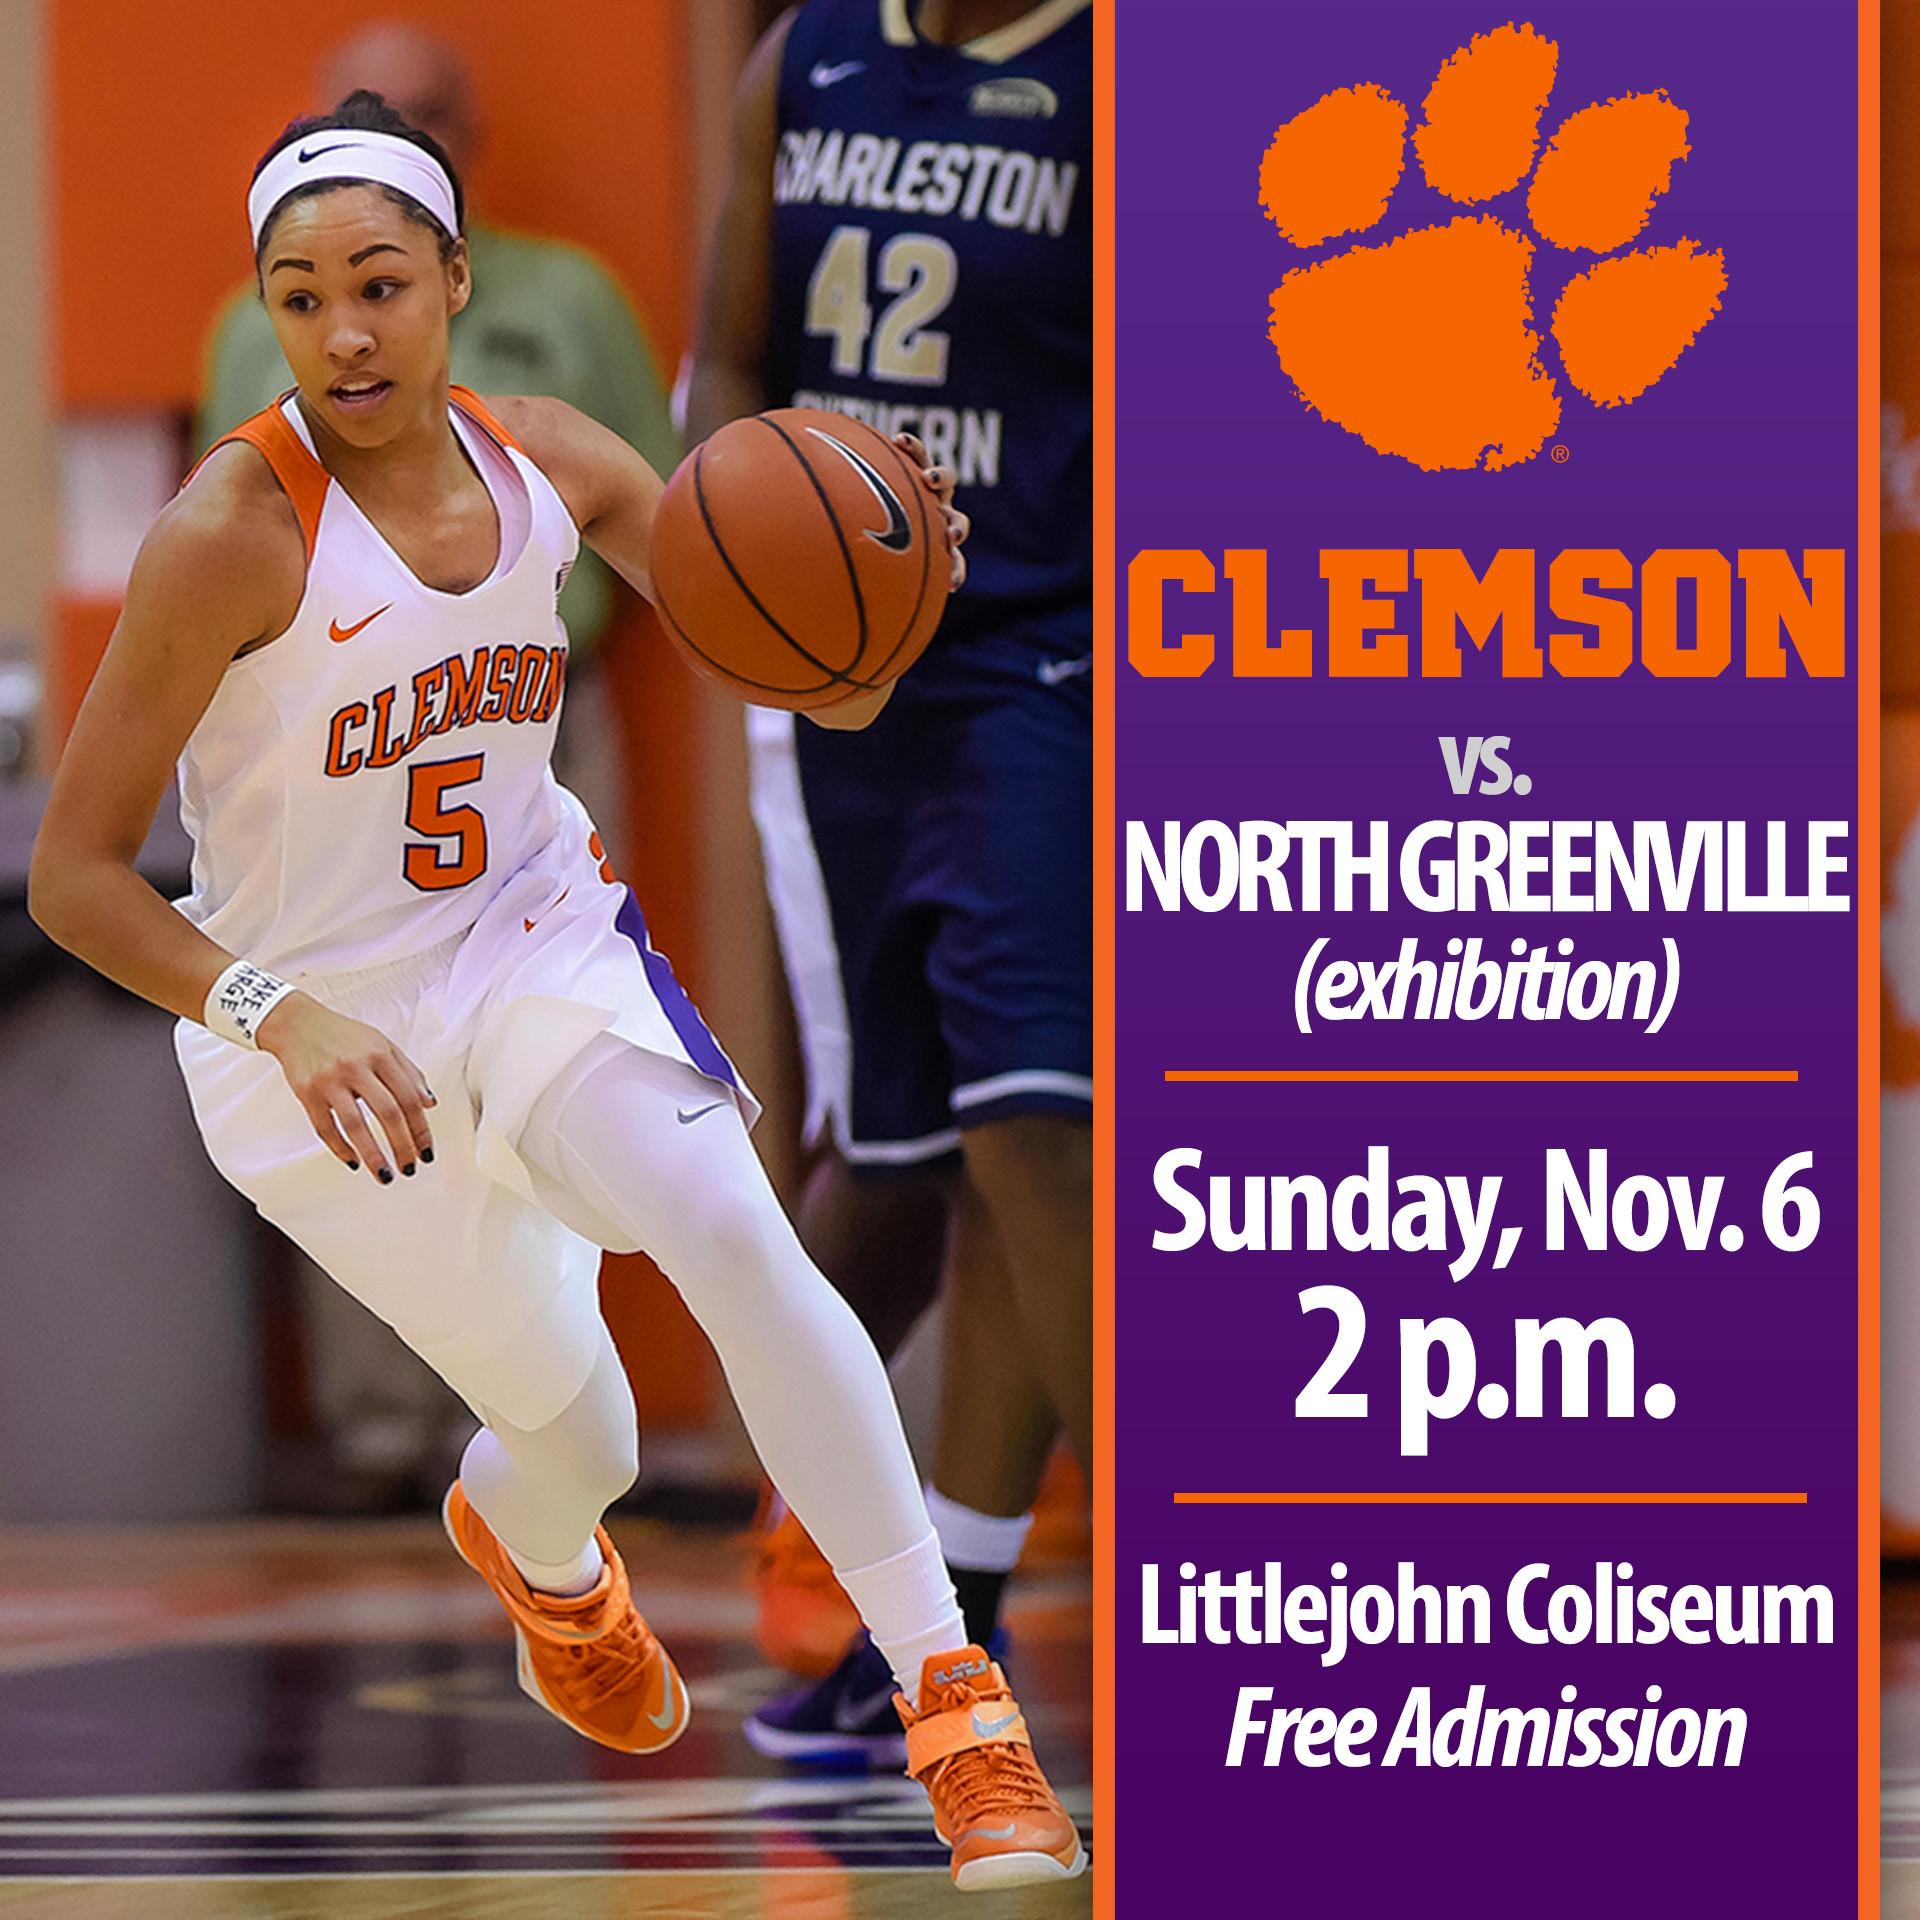 Tigers Host Exhibition vs. North Greenville Sunday